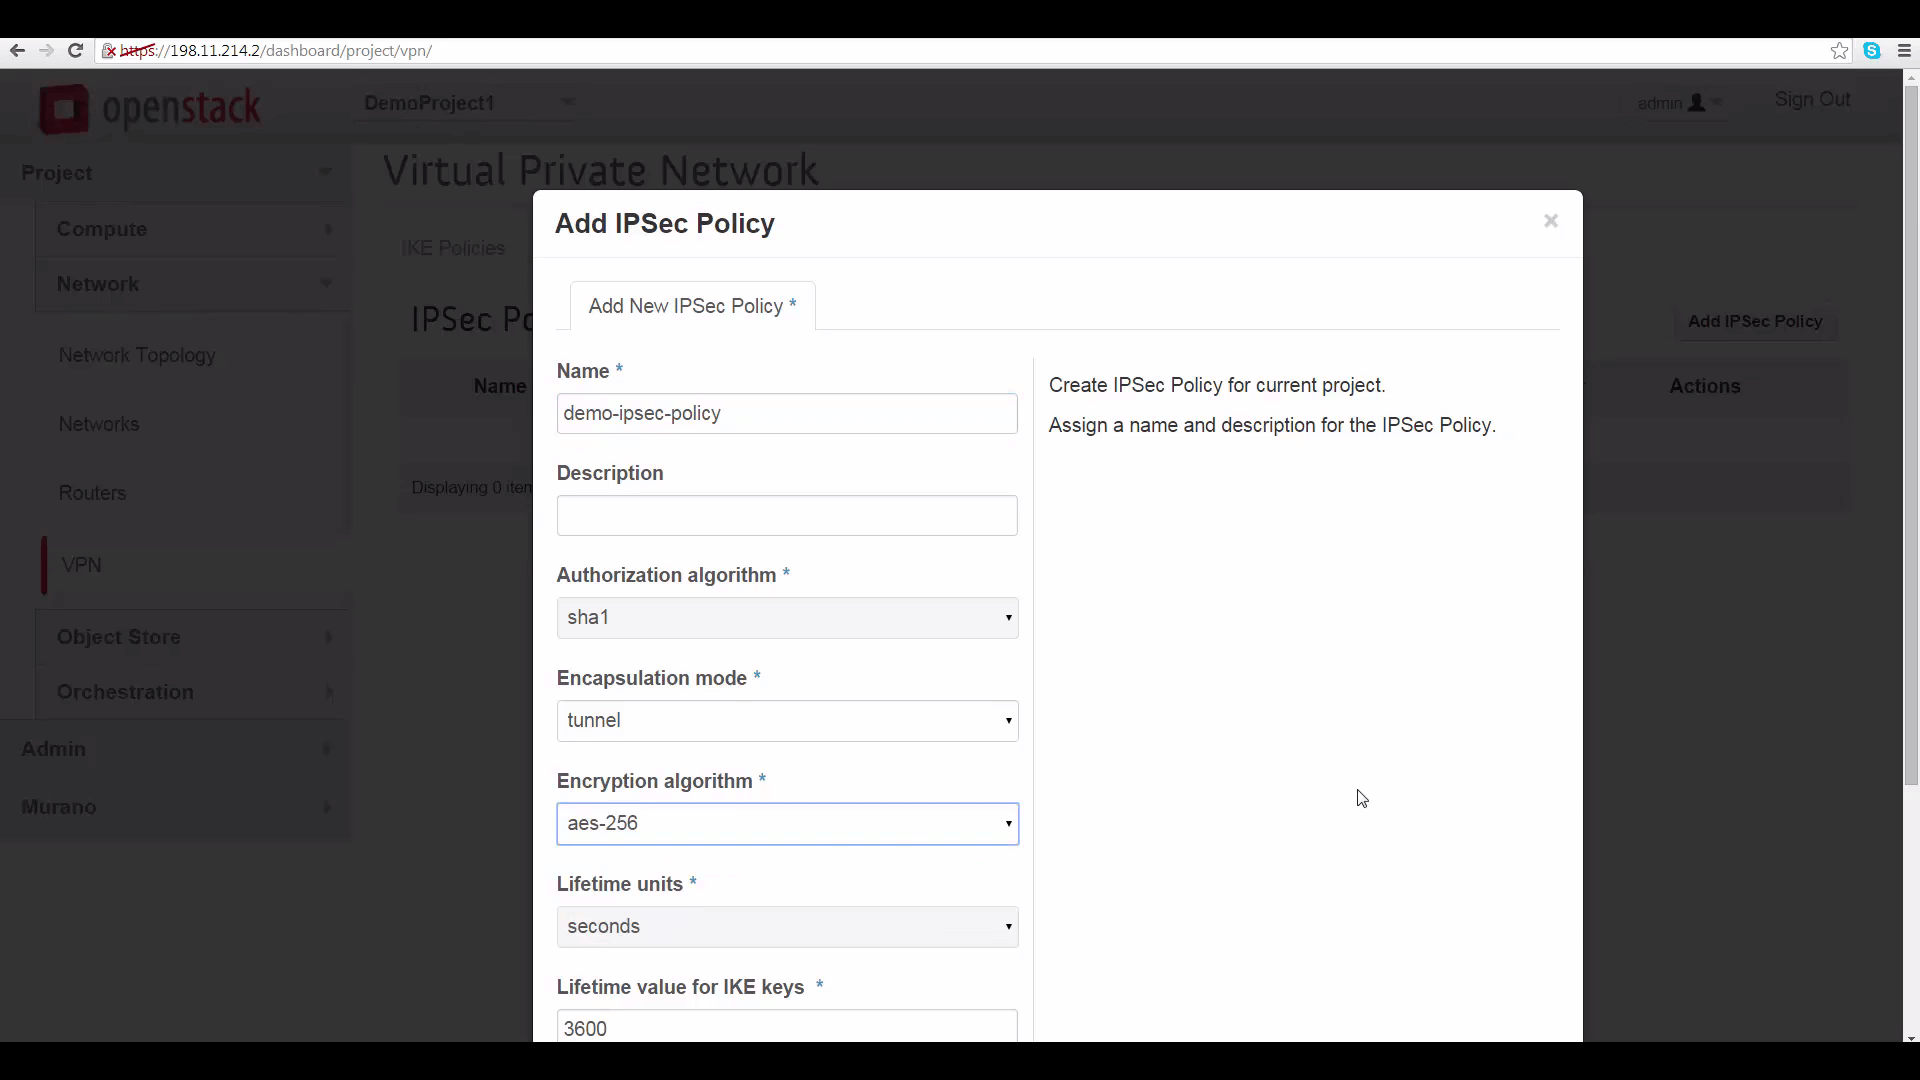 screenshot of Add IPSec Policy window in Mirantis OpenStack Express dashboard